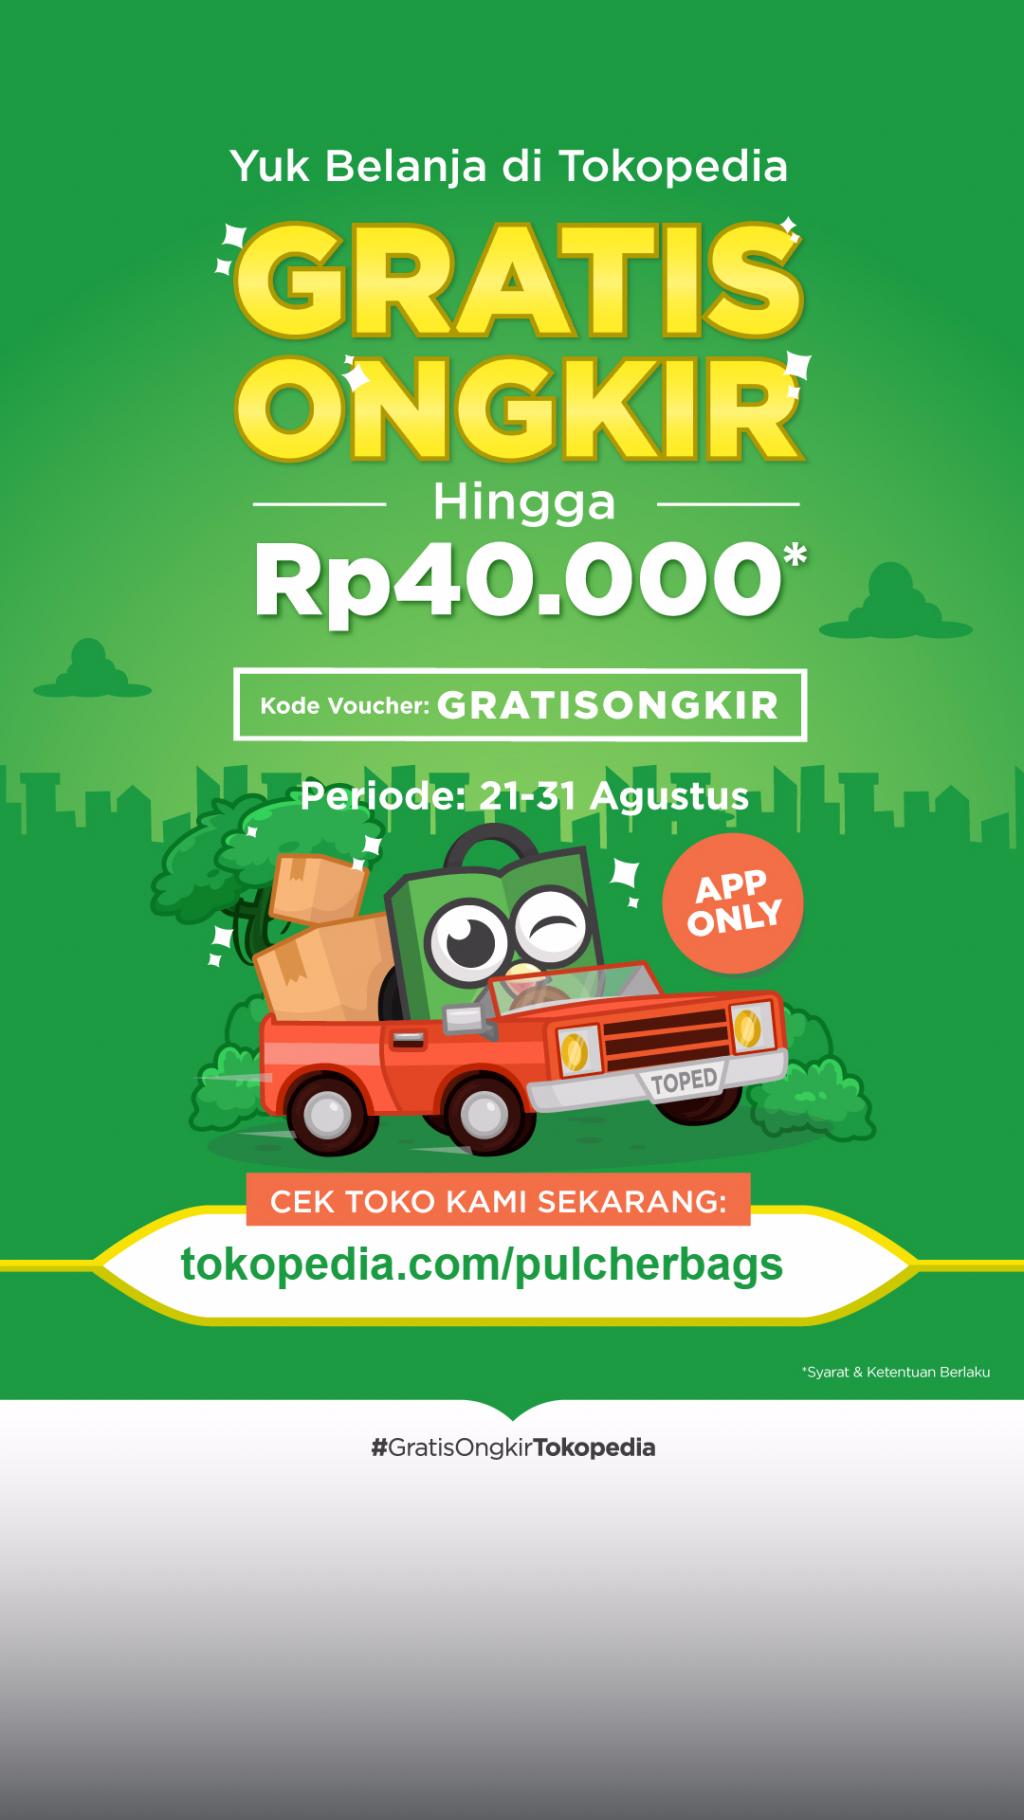 Pulcher Promo Gratis Ongkir Tokopedia Previous Next